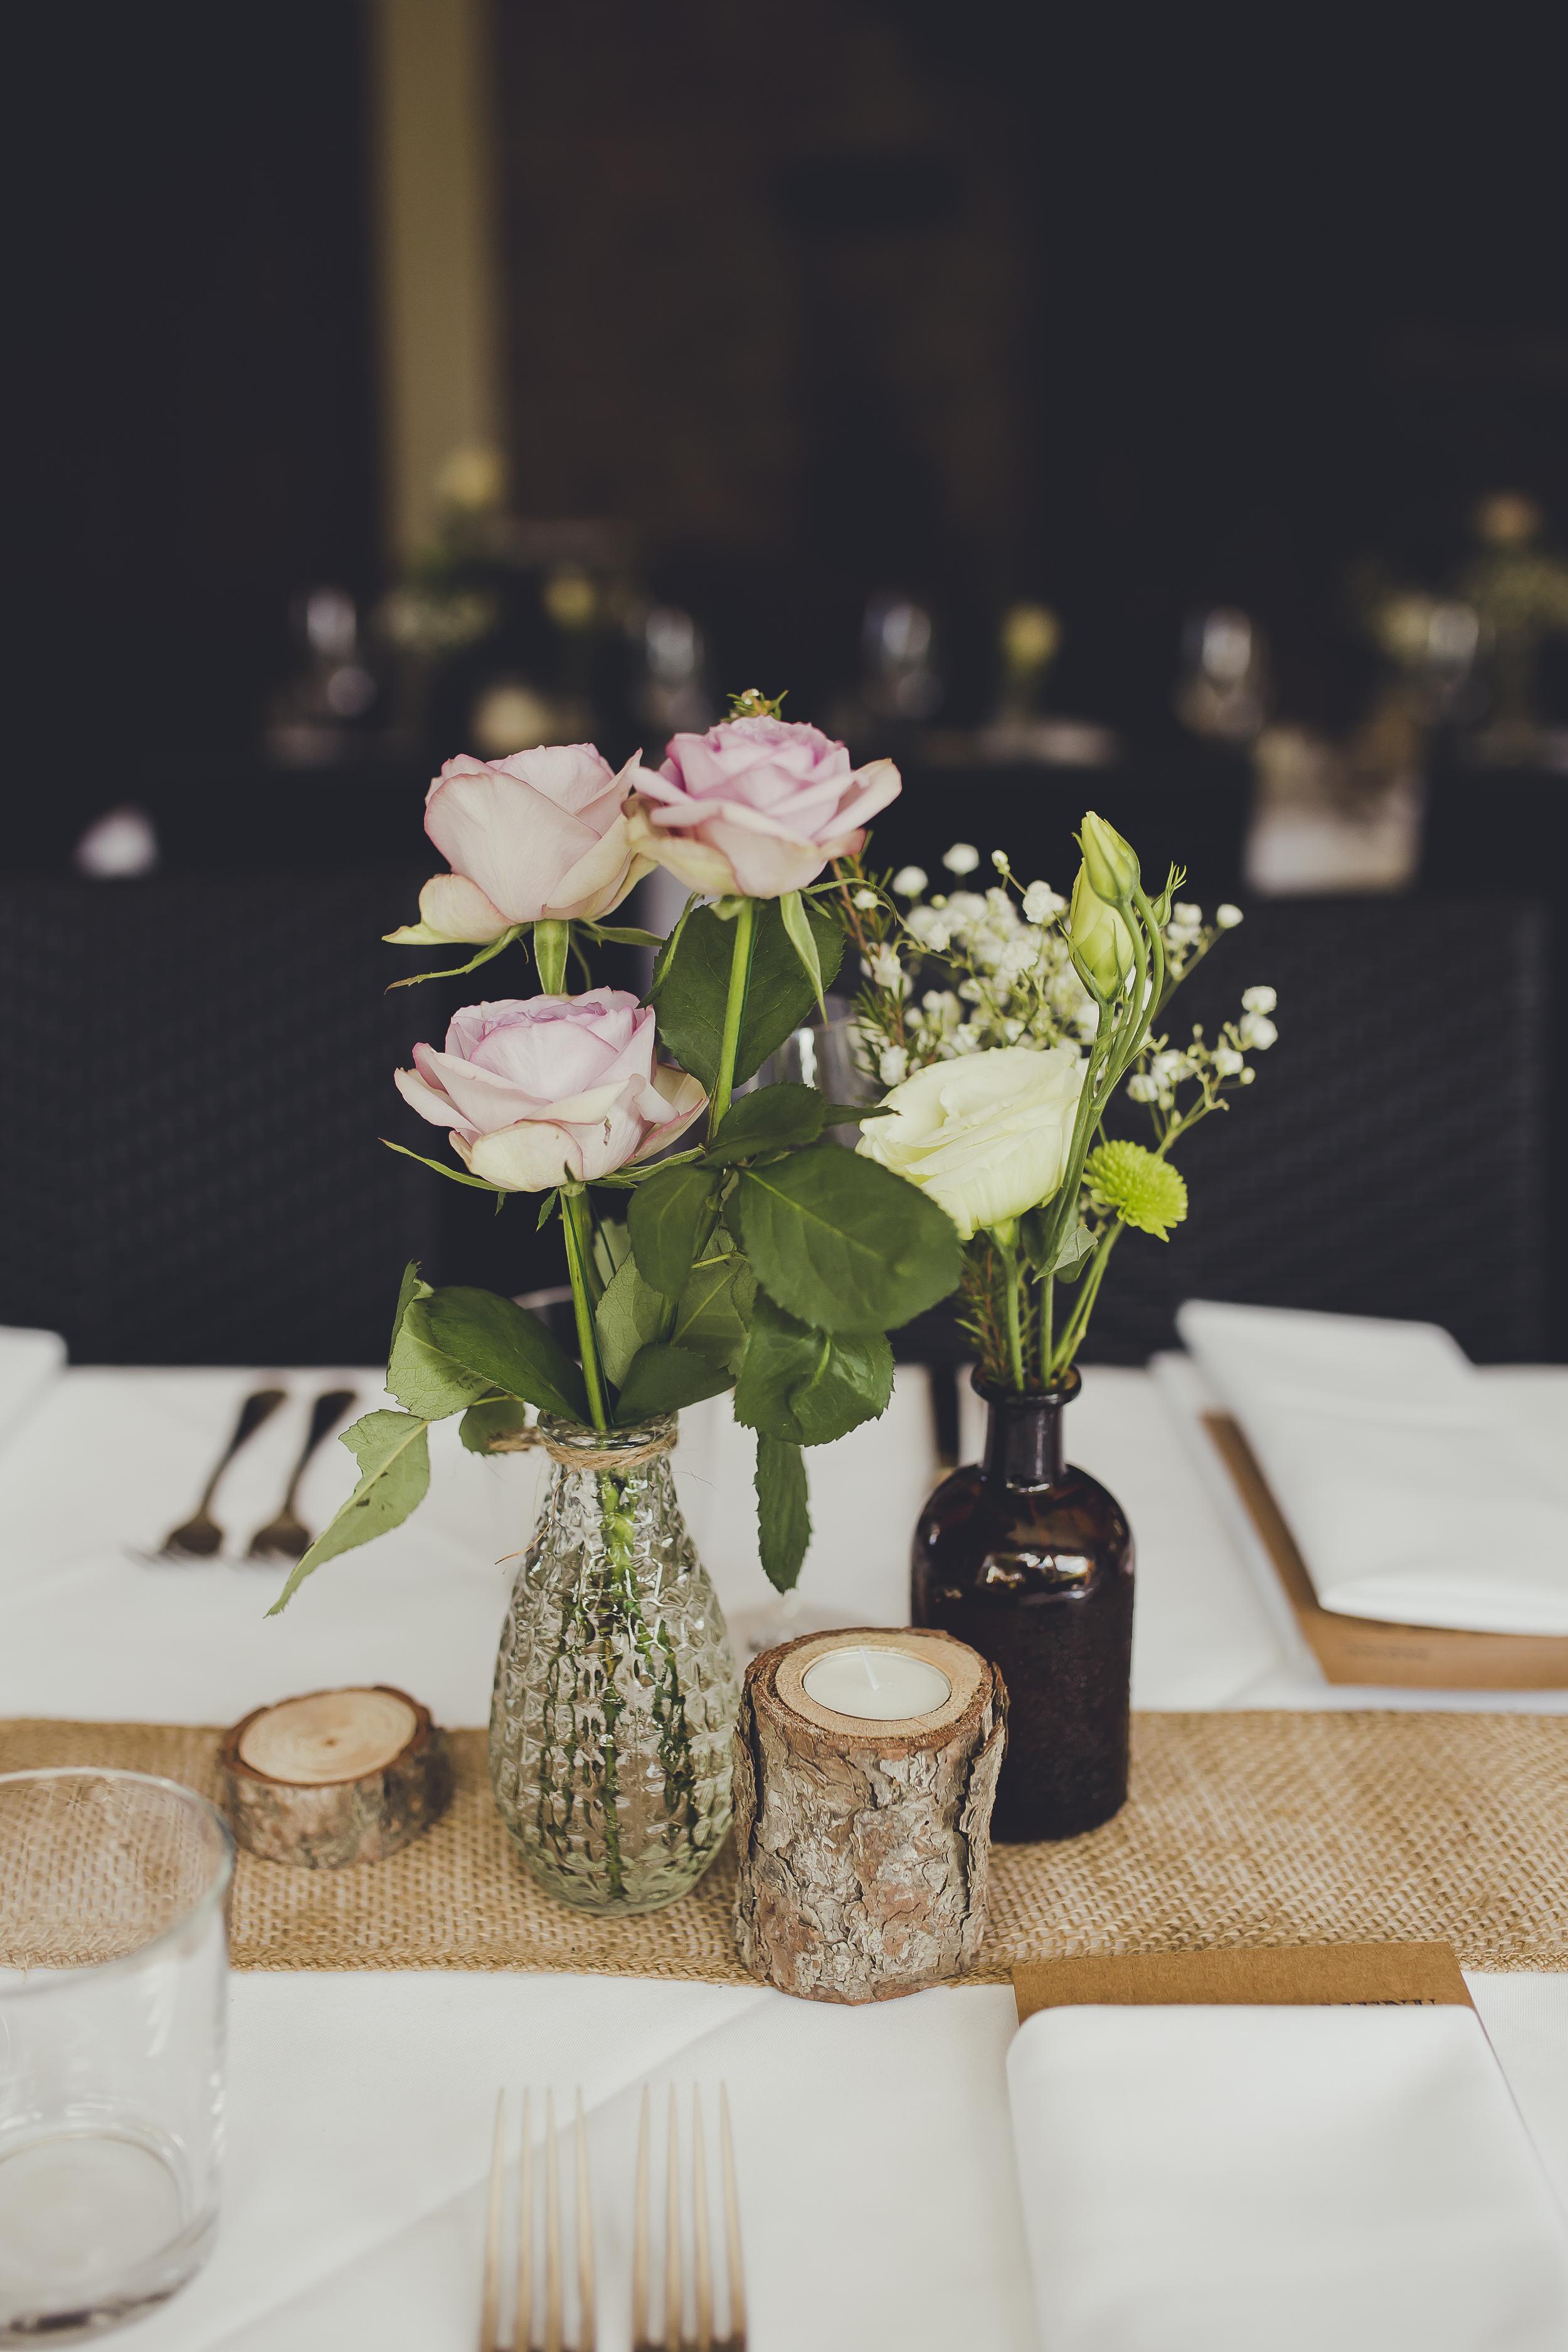 Byron Bay Wedding Harvest Cafe - Carly Tia Photography 003.jpg